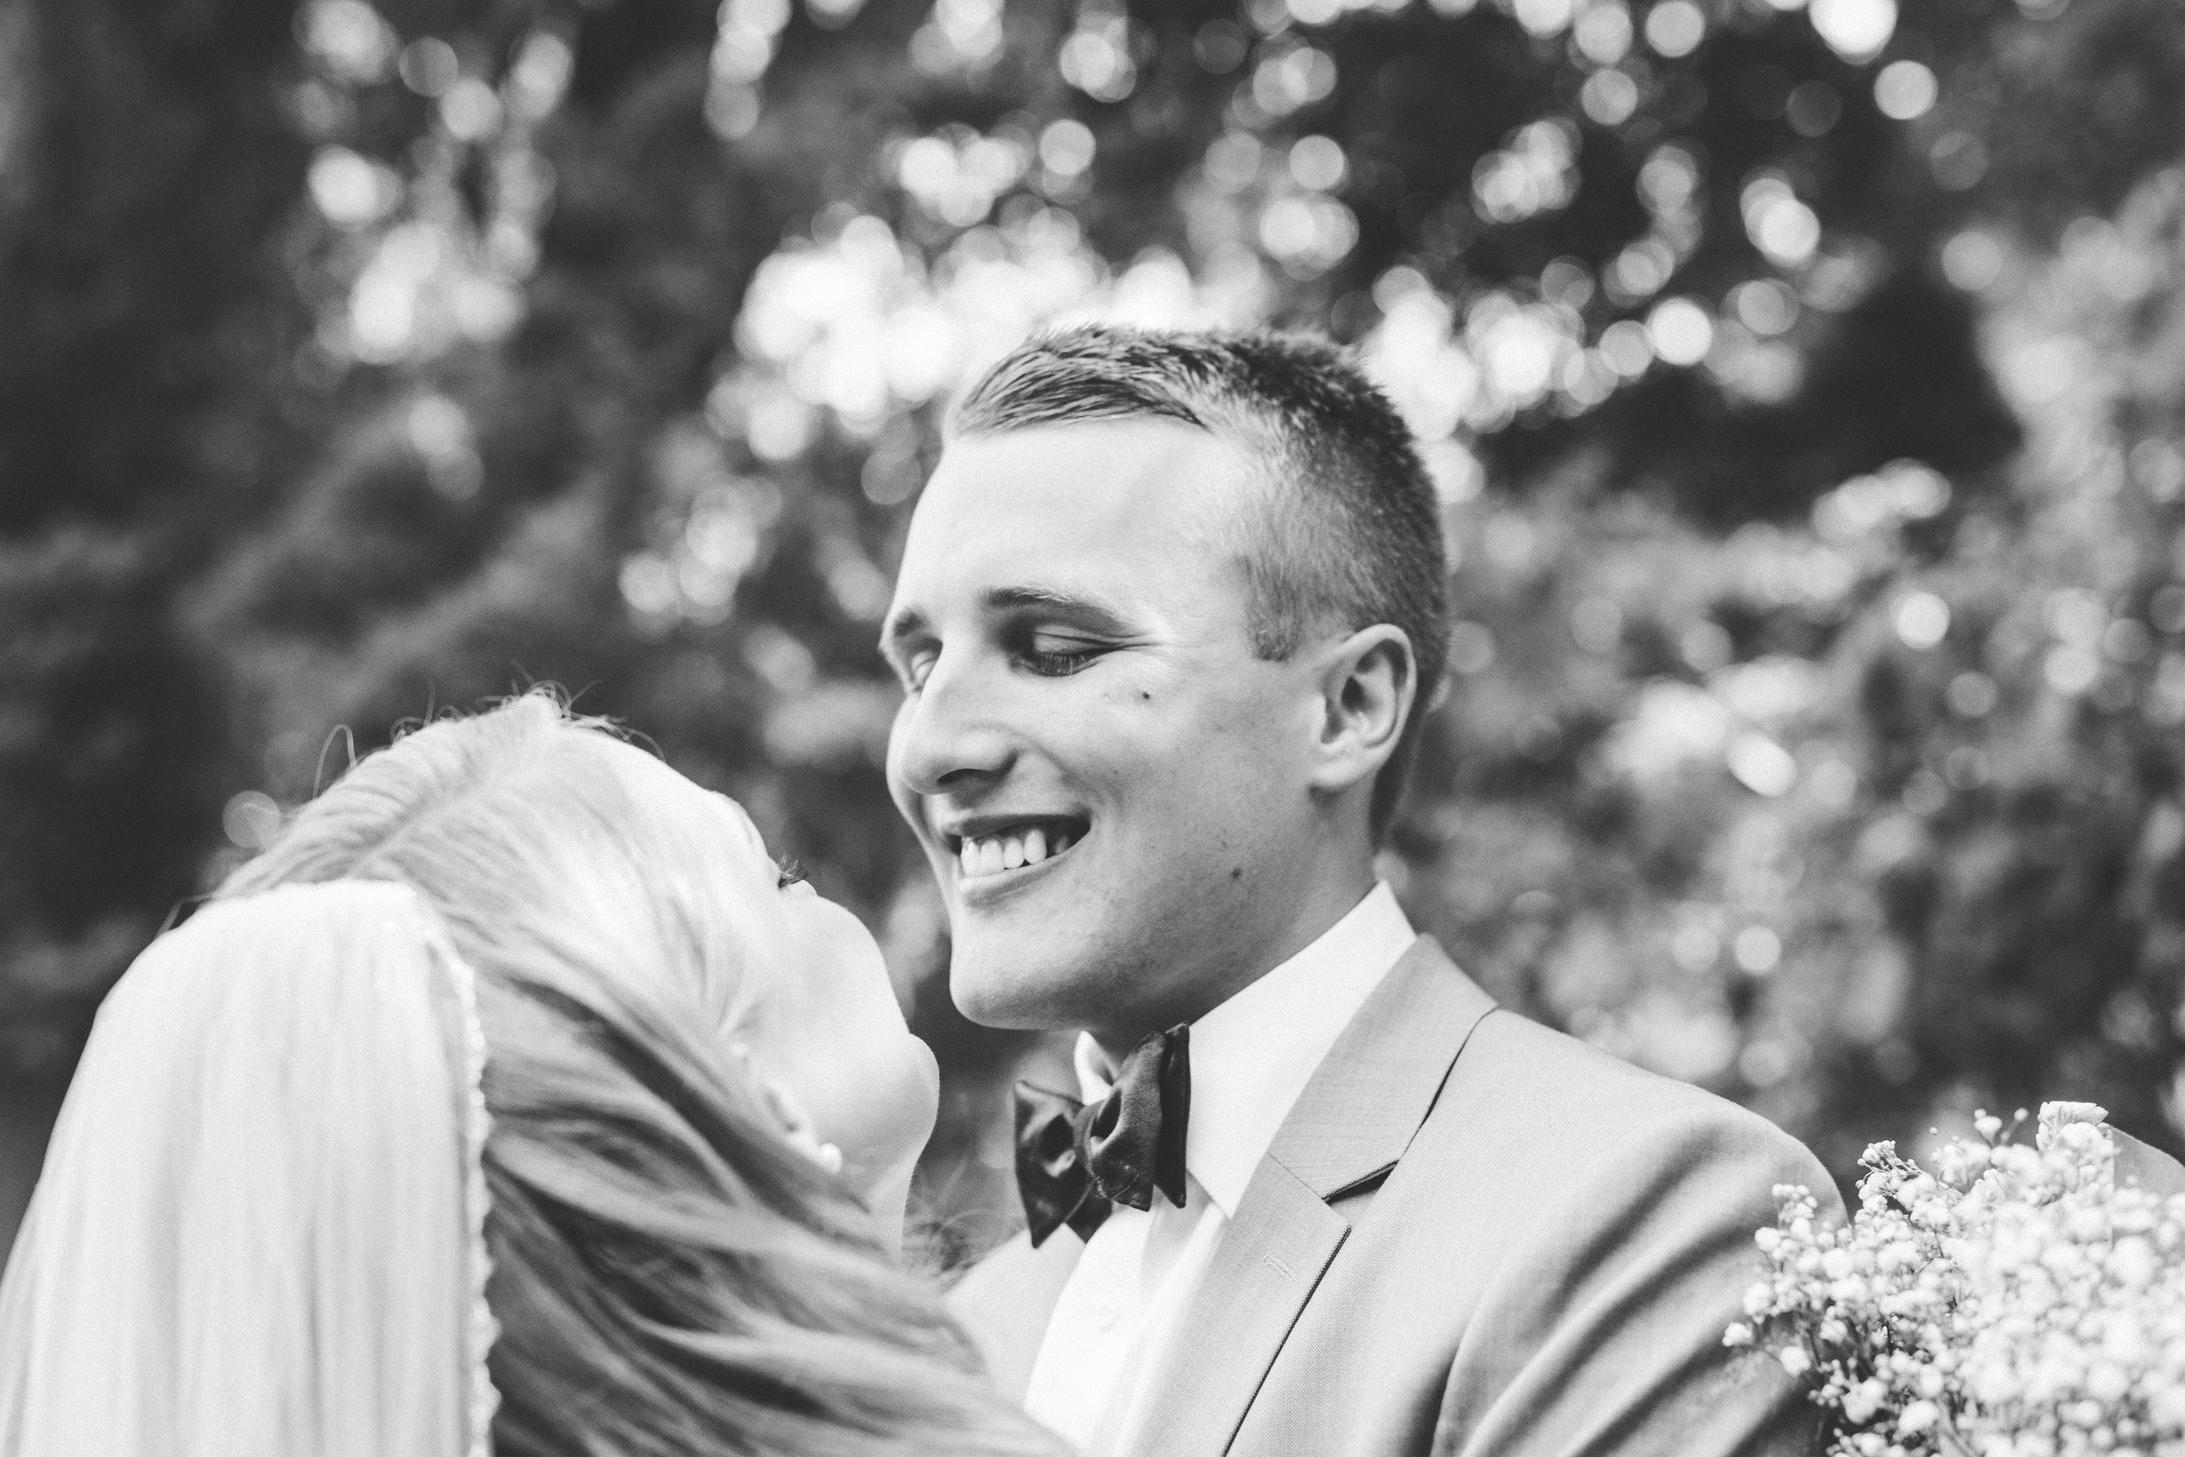 IMG_2294 VANCOUVER WEDDING PHOTOGRAPHER JENNIFER PICARD PHOTOGRAPHY.jpg